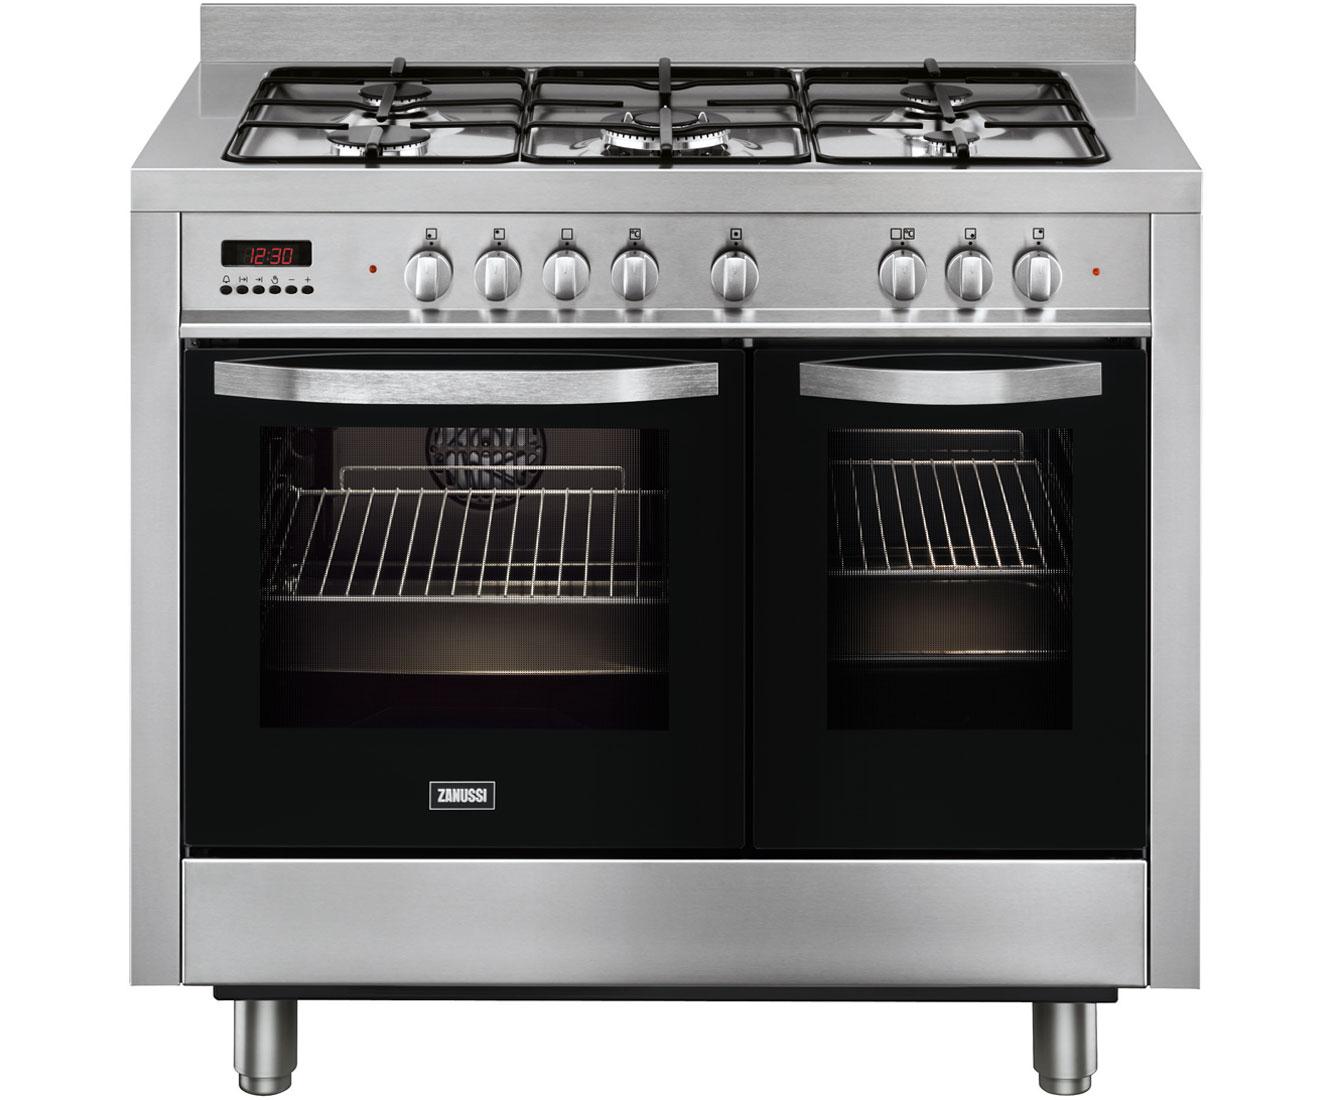 Zanussi ZCK18307XA Free Standing Range Cooker in Stainless Steel